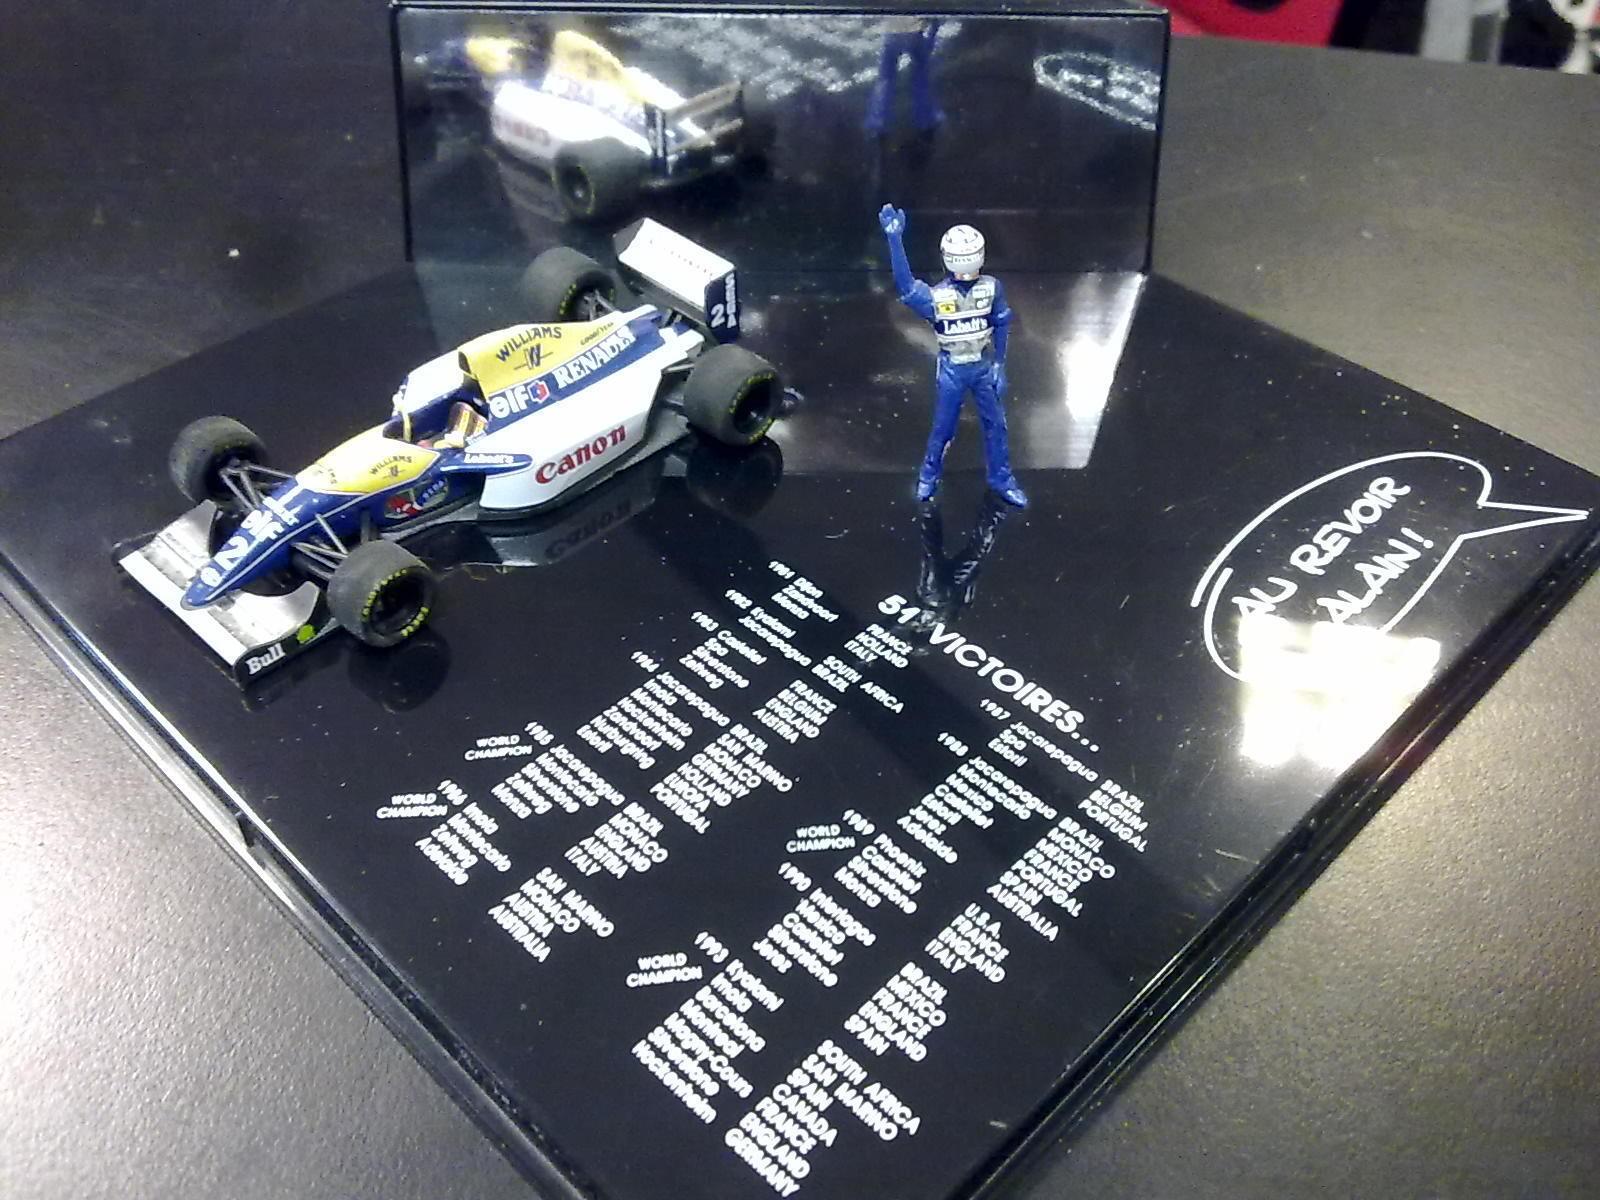 Au revoir Alain, Williams Renault FW15C 1993 1 43  2 Alain Prost, 51 Victoires